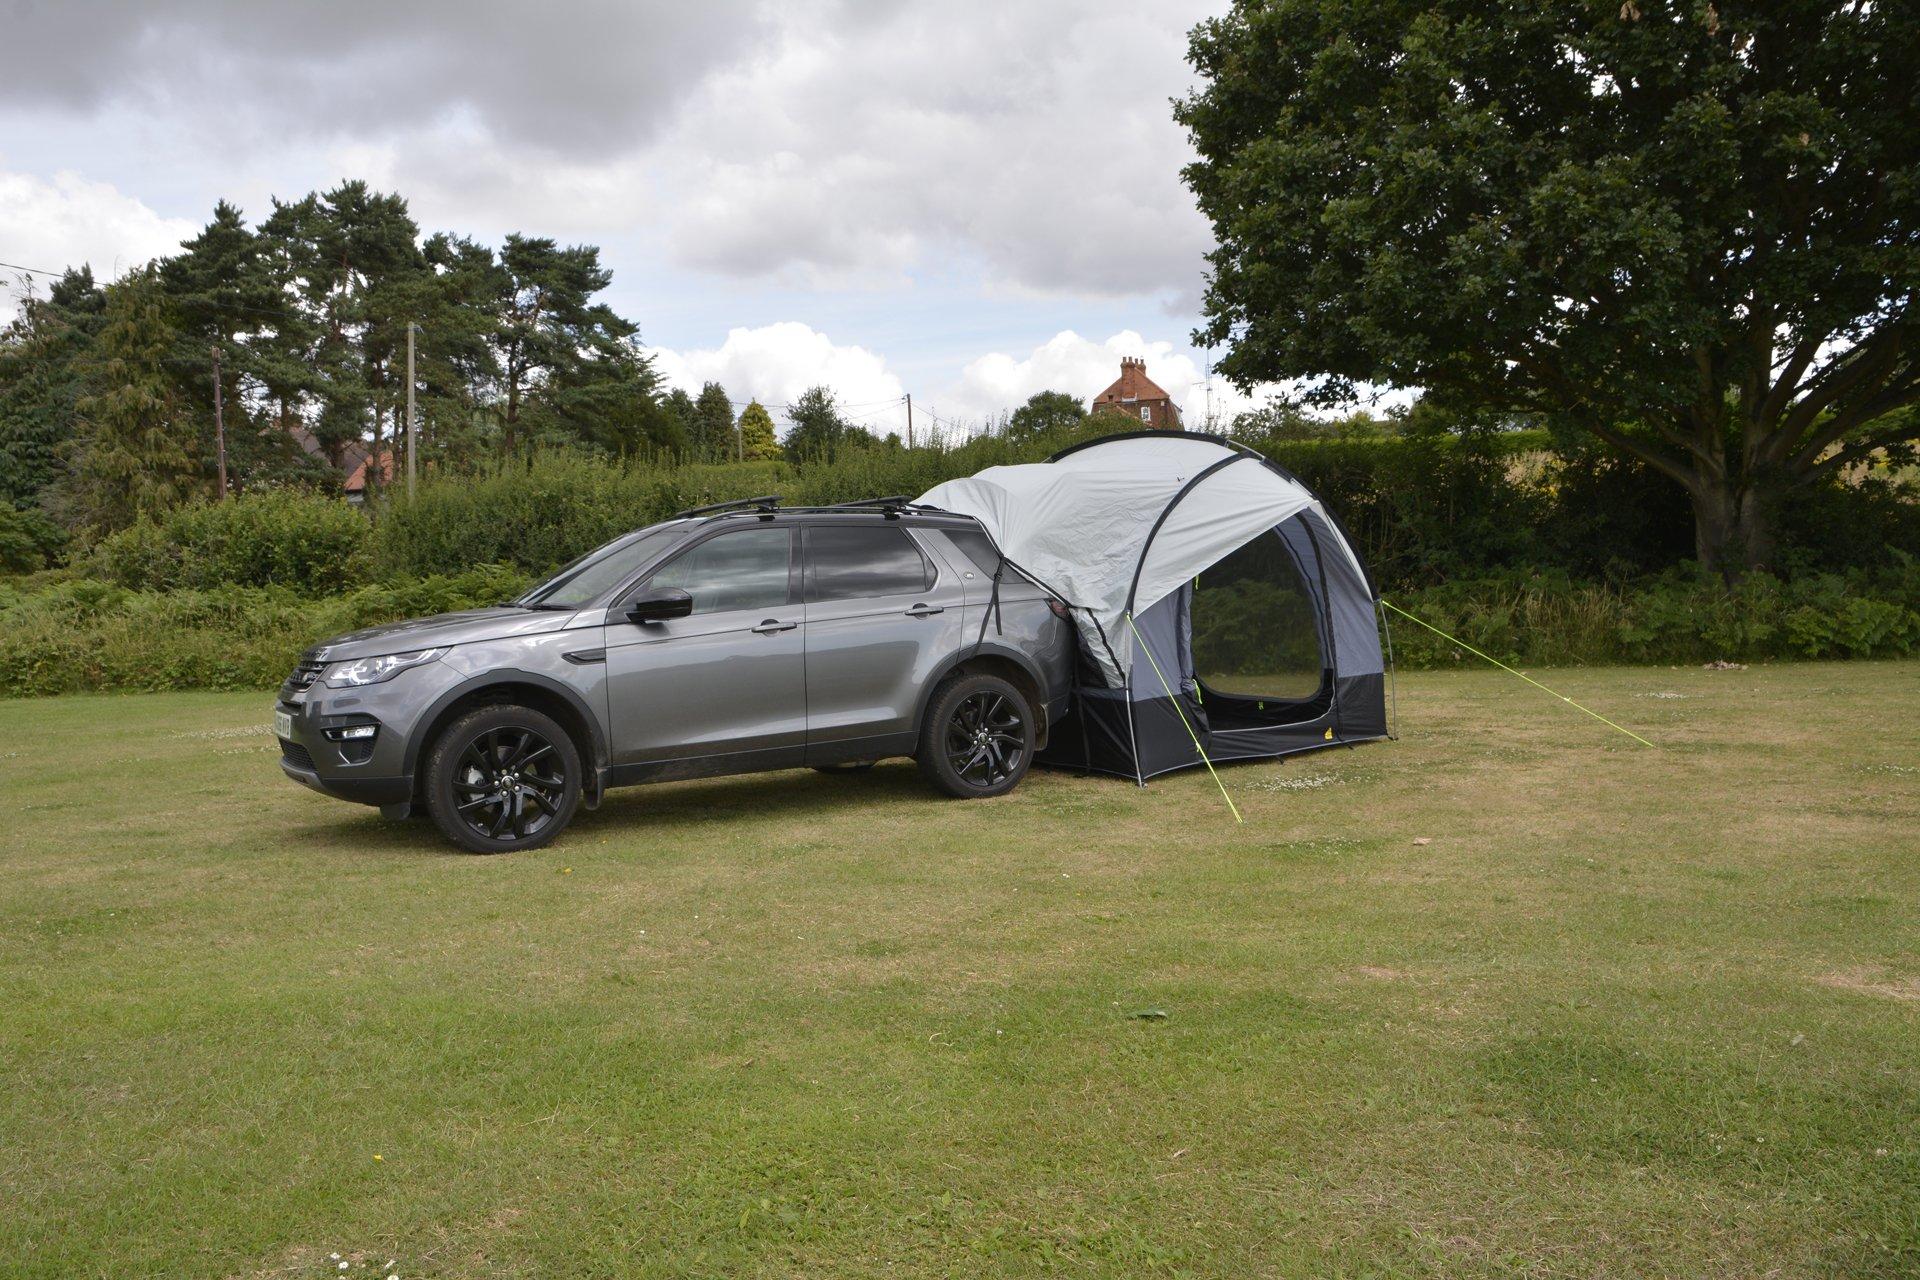 Kampa Travel Pod Tailgater Driveaway Awning